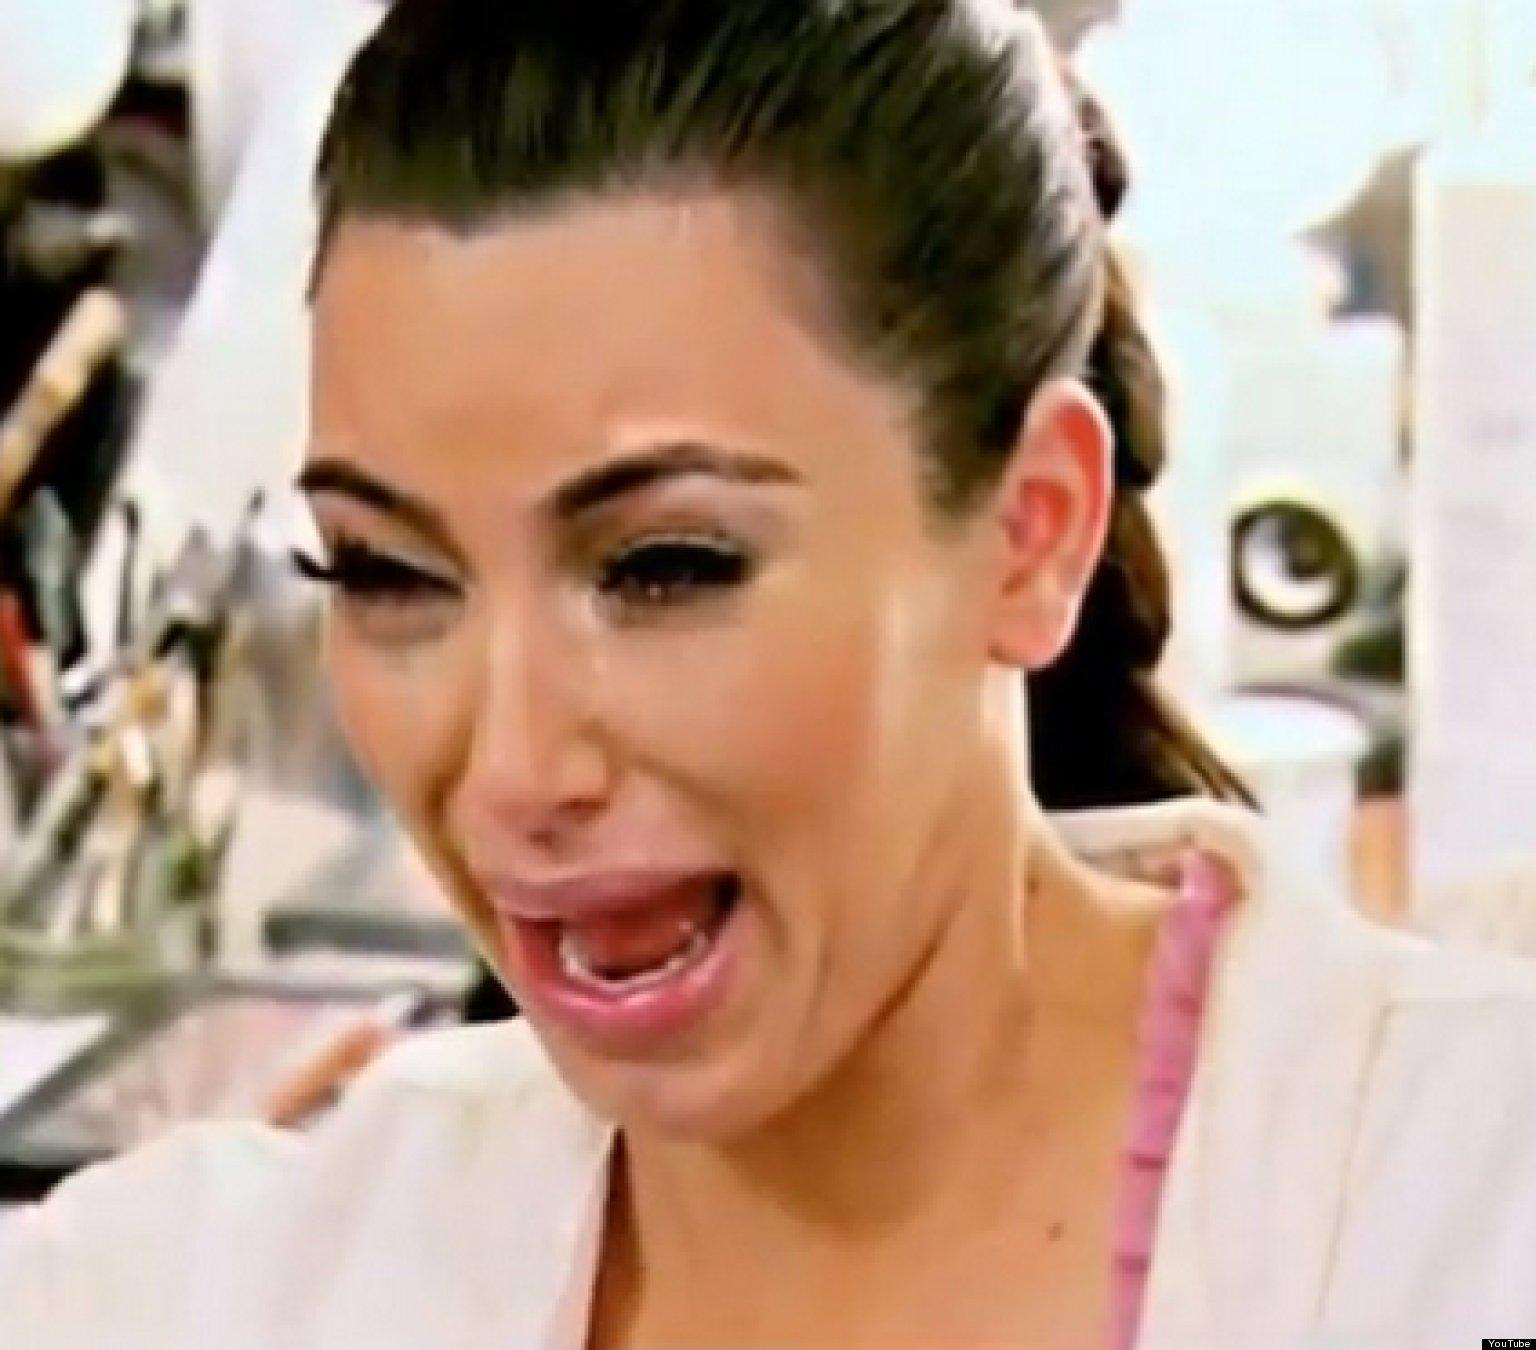 50 Kim Kardashian Crying Wallpaper On Wallpapersafari